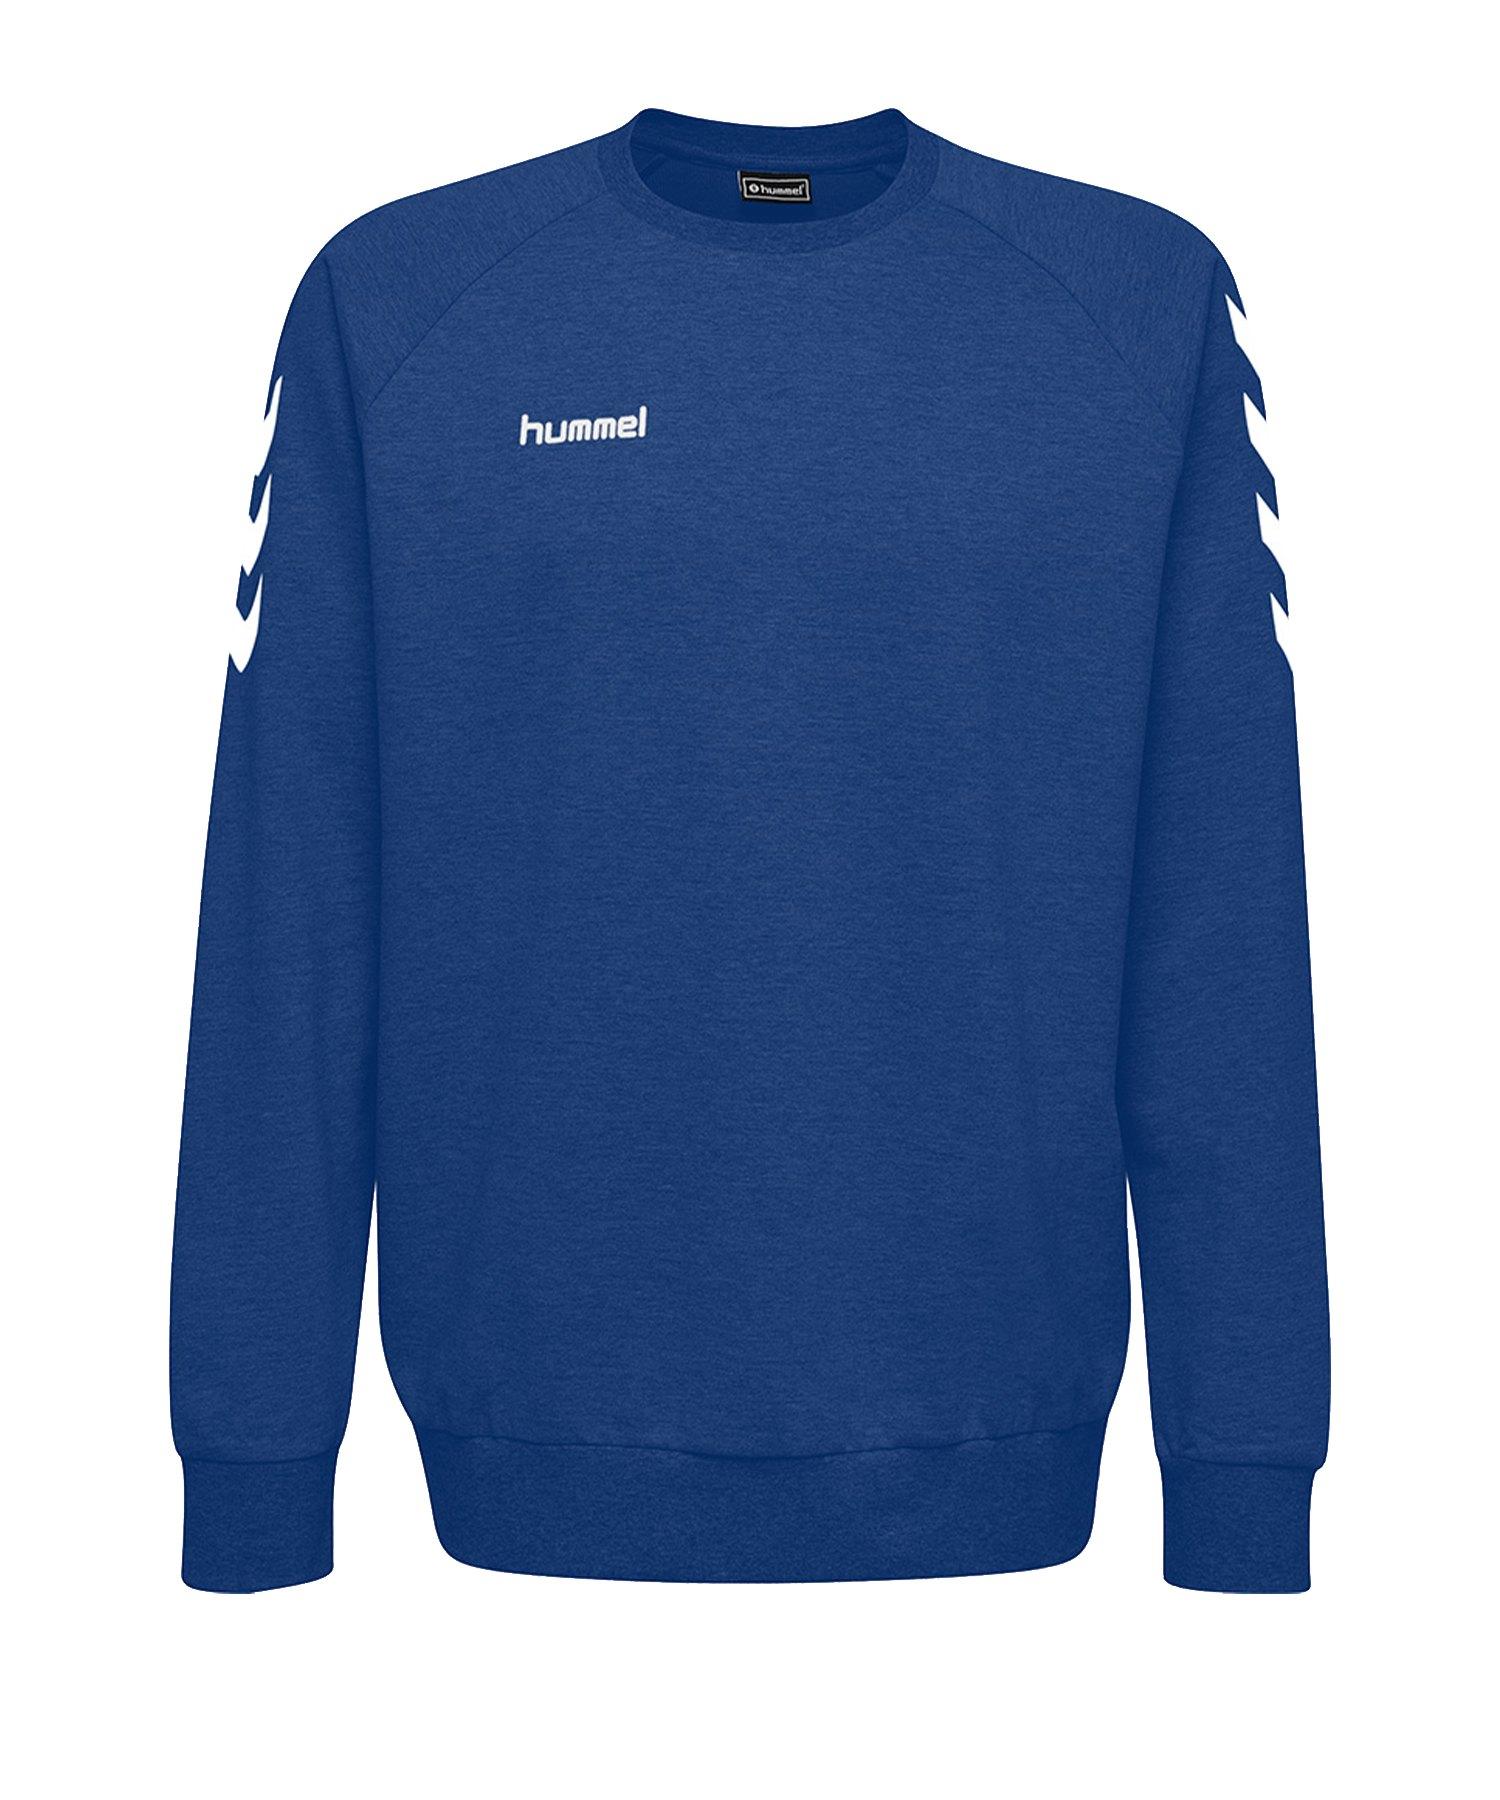 Hummel Cotton Sweatshirt Blau F7045 - Blau